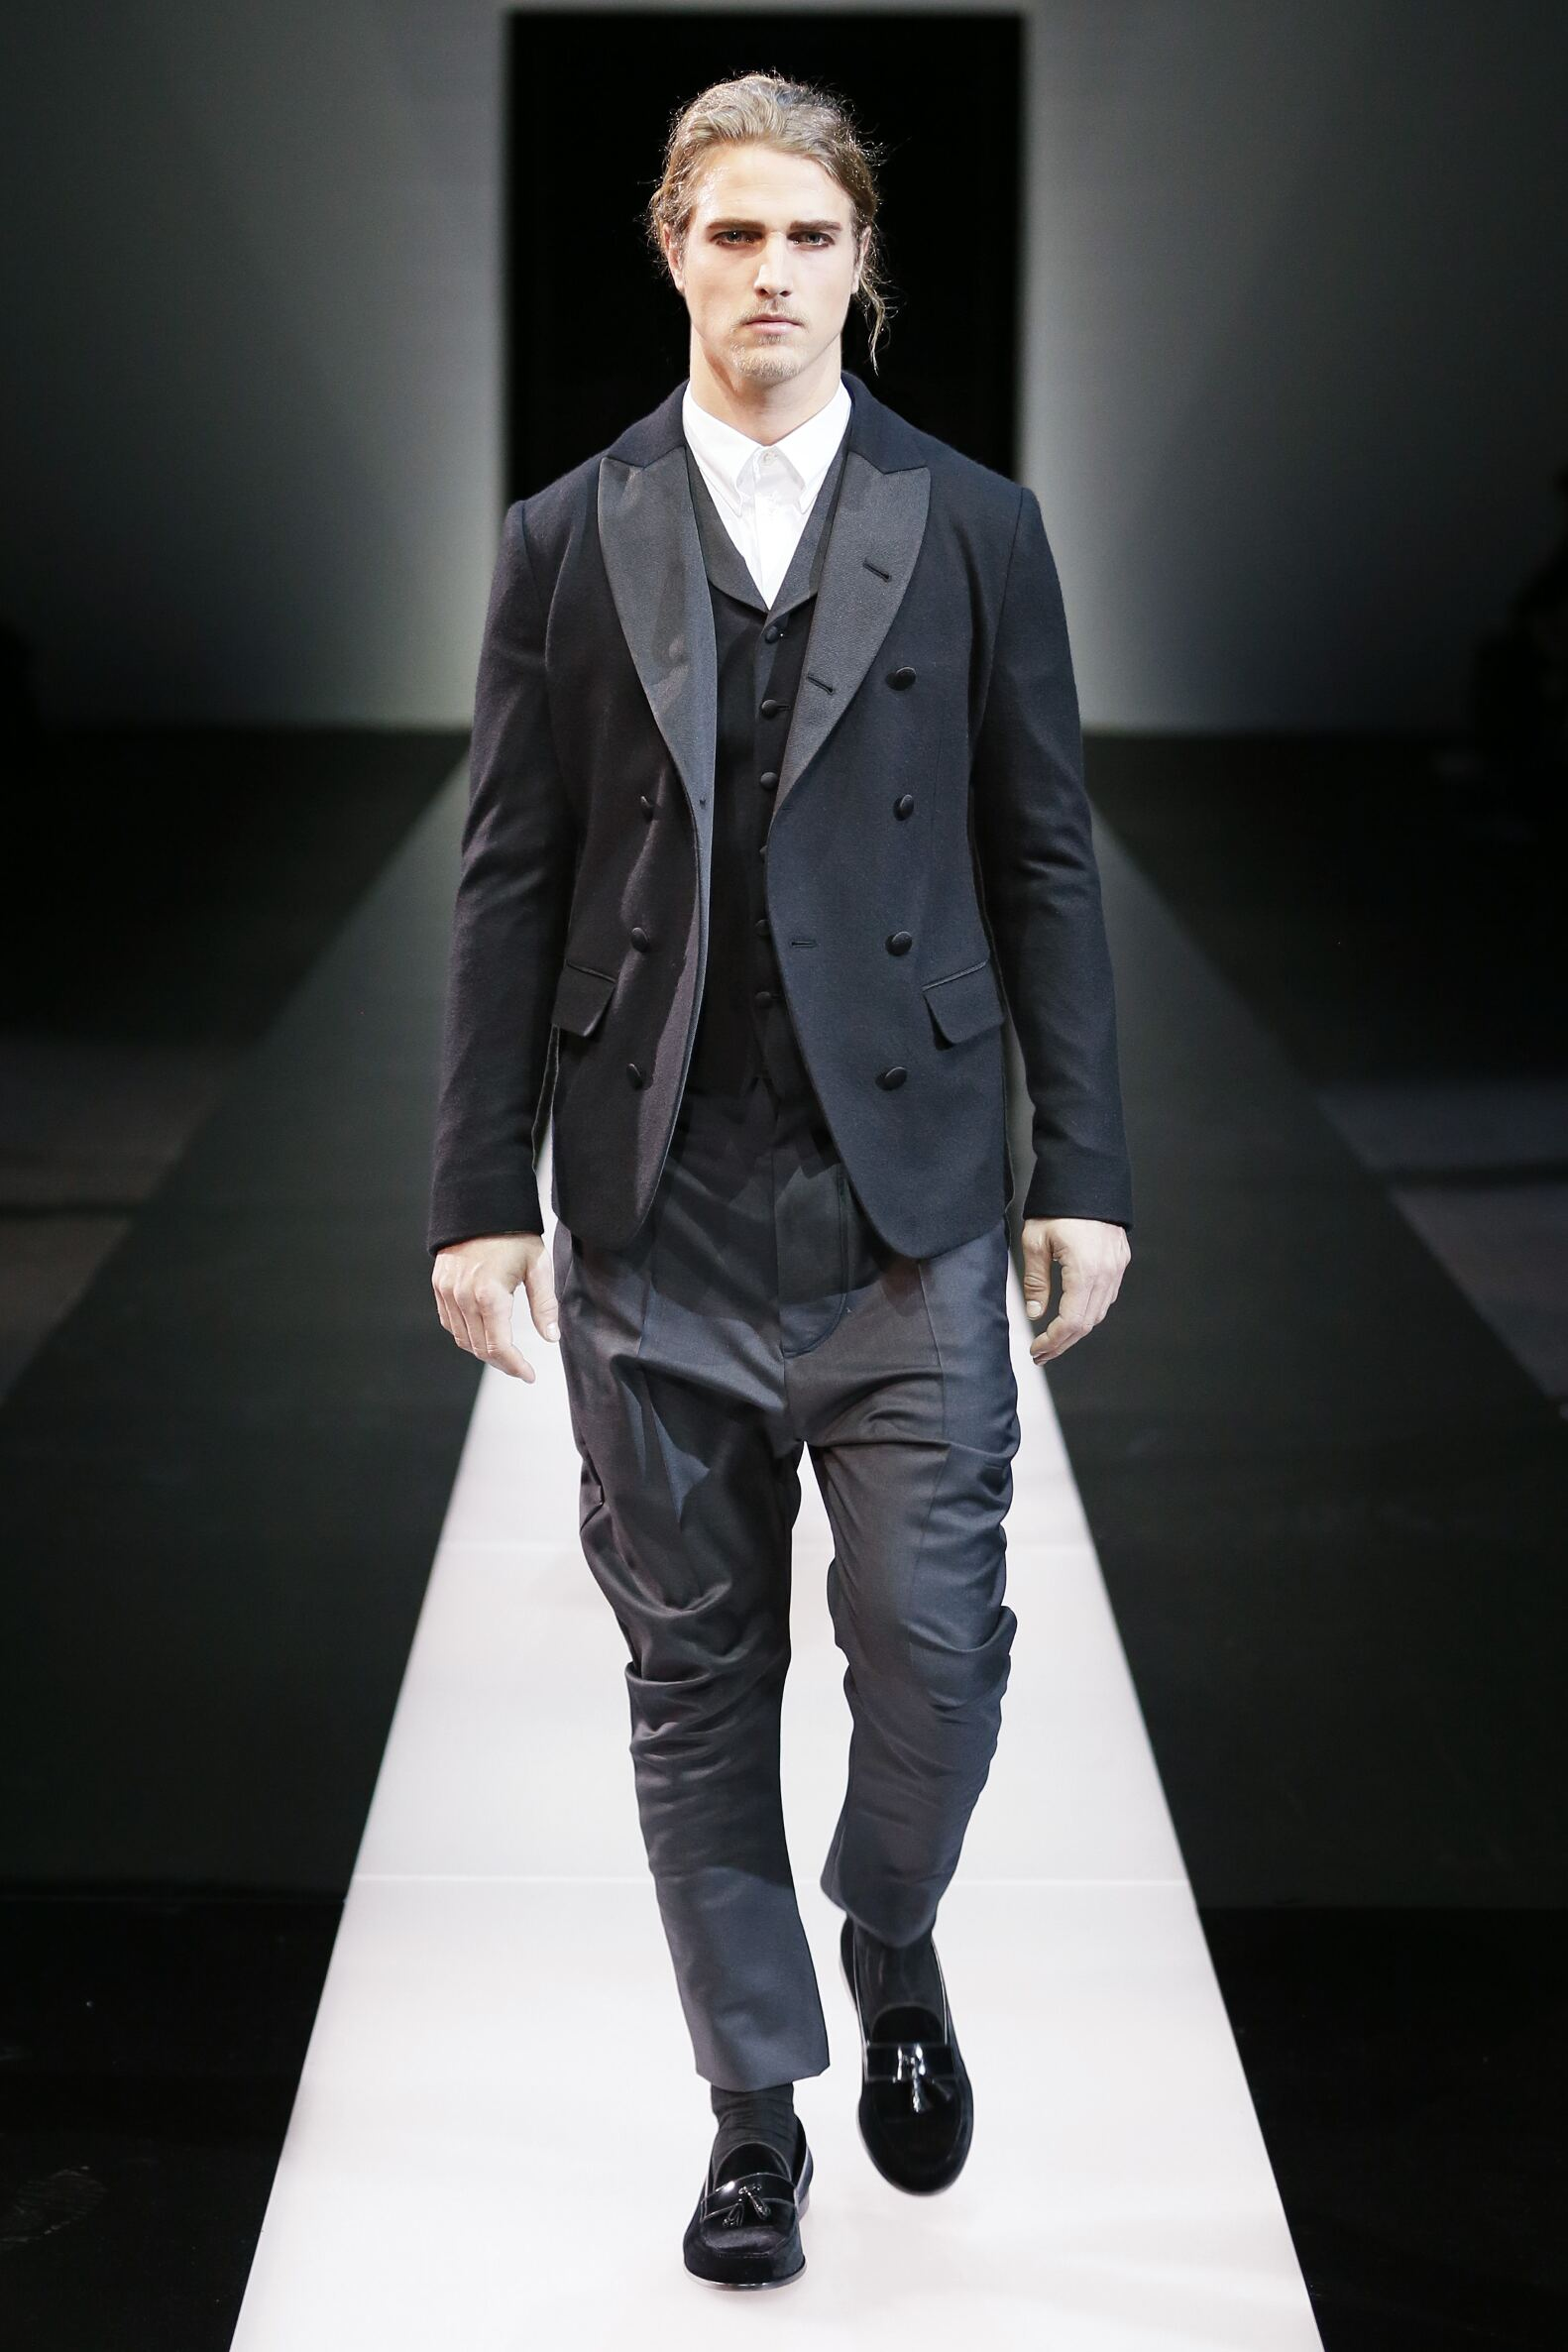 2015 2016 Giorgio Armani Collection Fashion Show FW